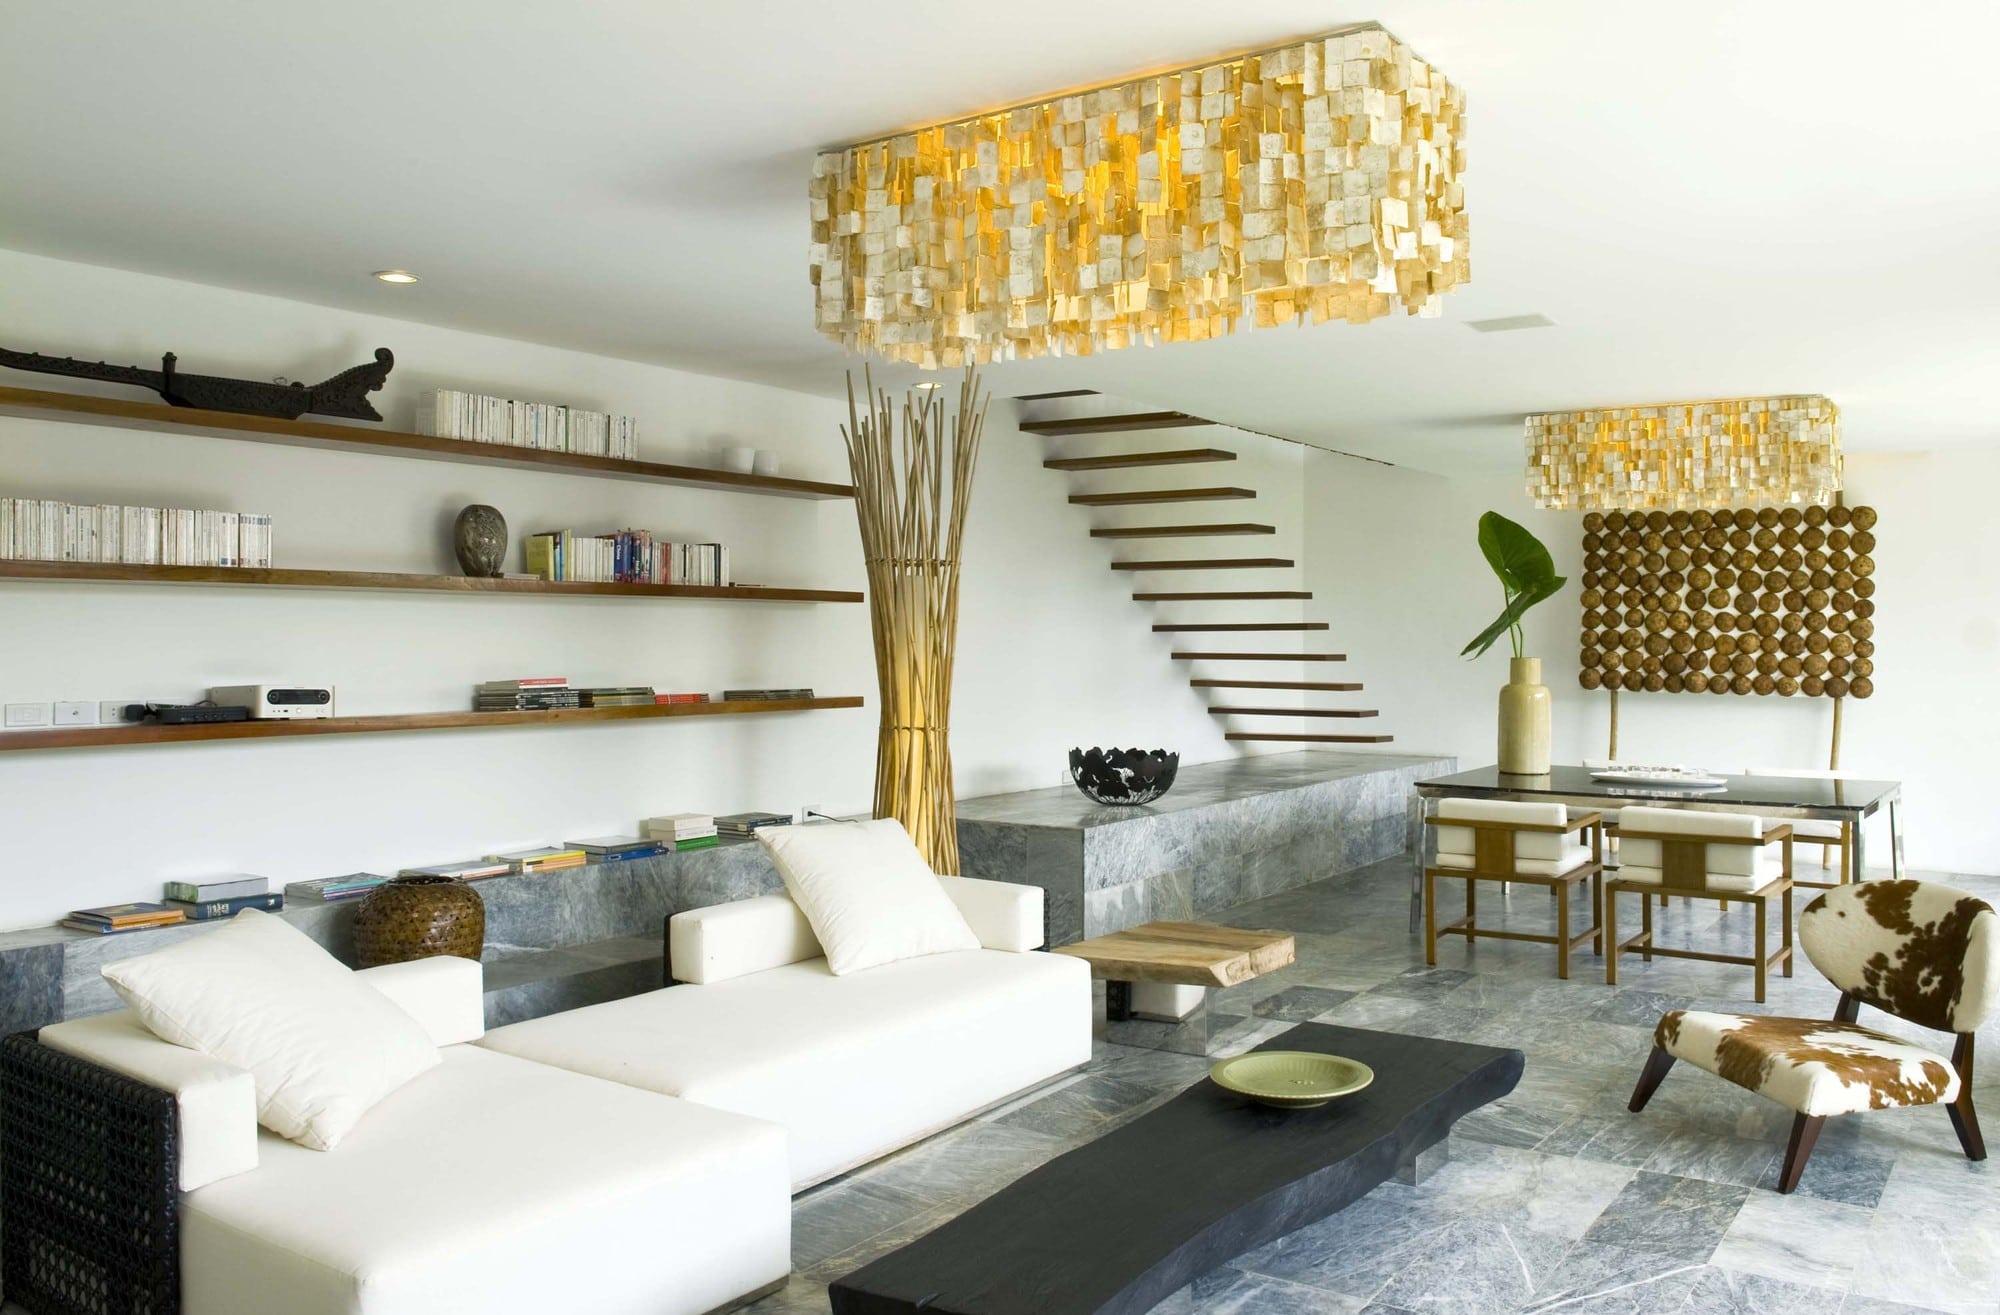 Dise o de casa r stica fachada interiores y planos for Decoracion de interiores comedor